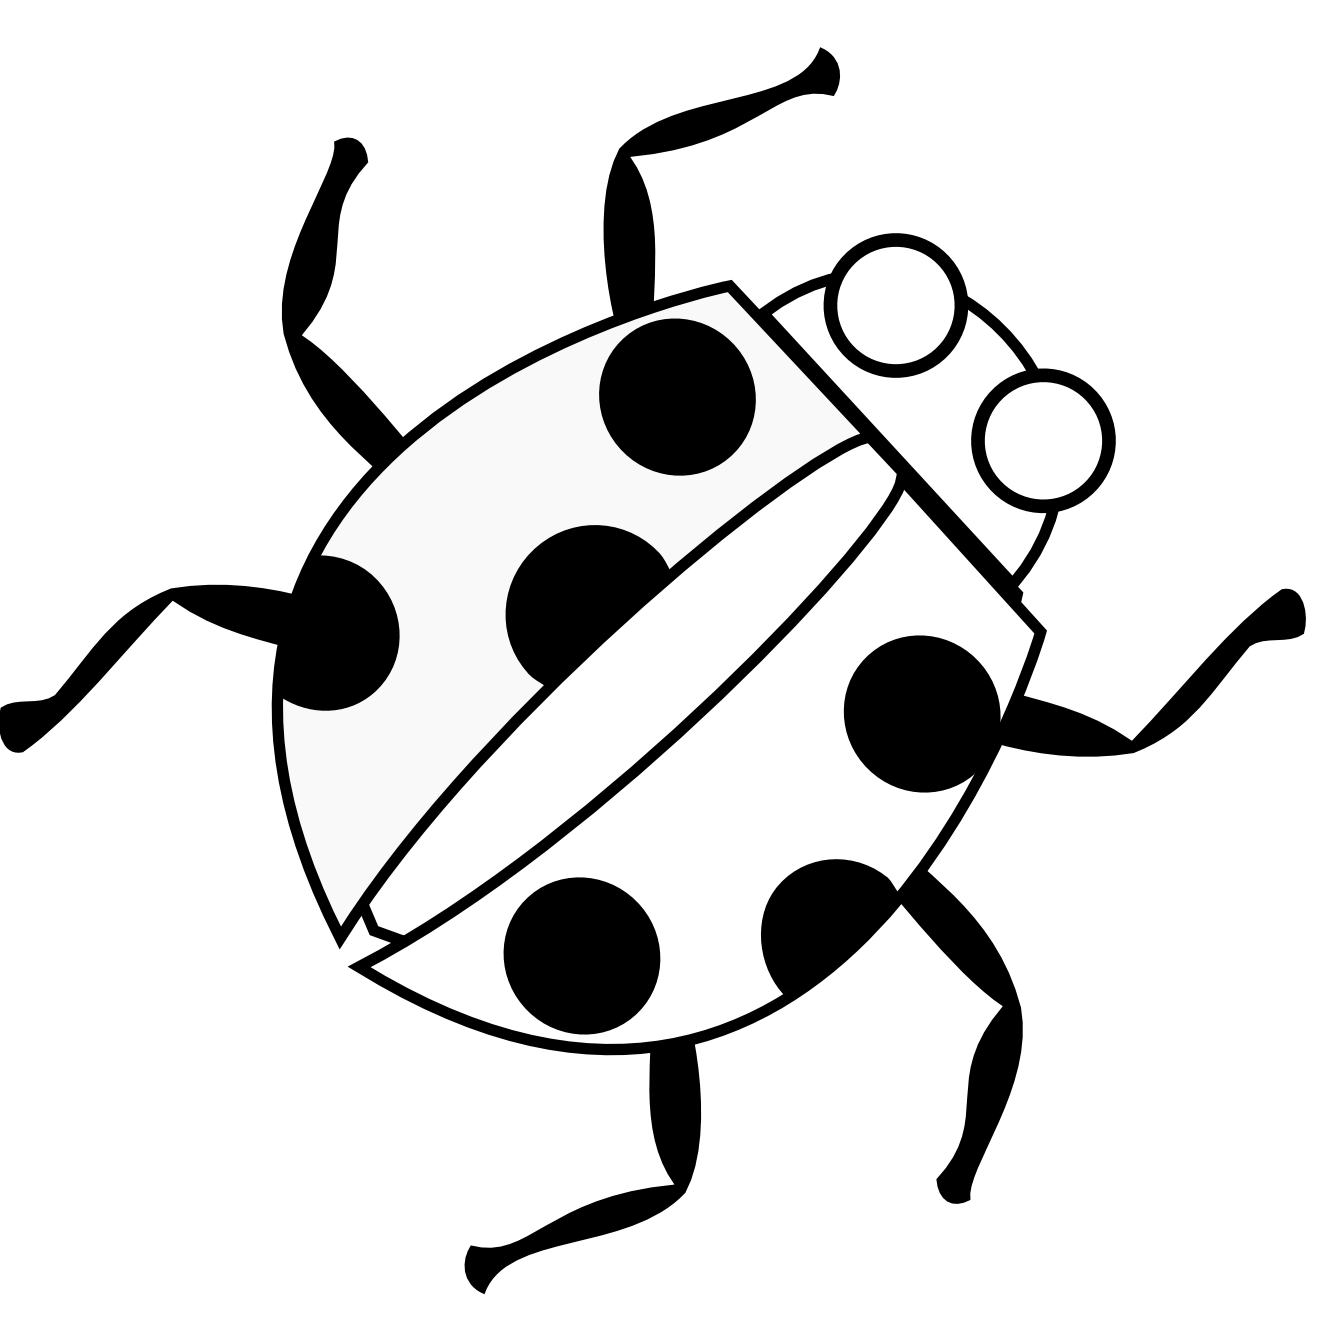 1331x1331 Mayflower Black And White Clipart